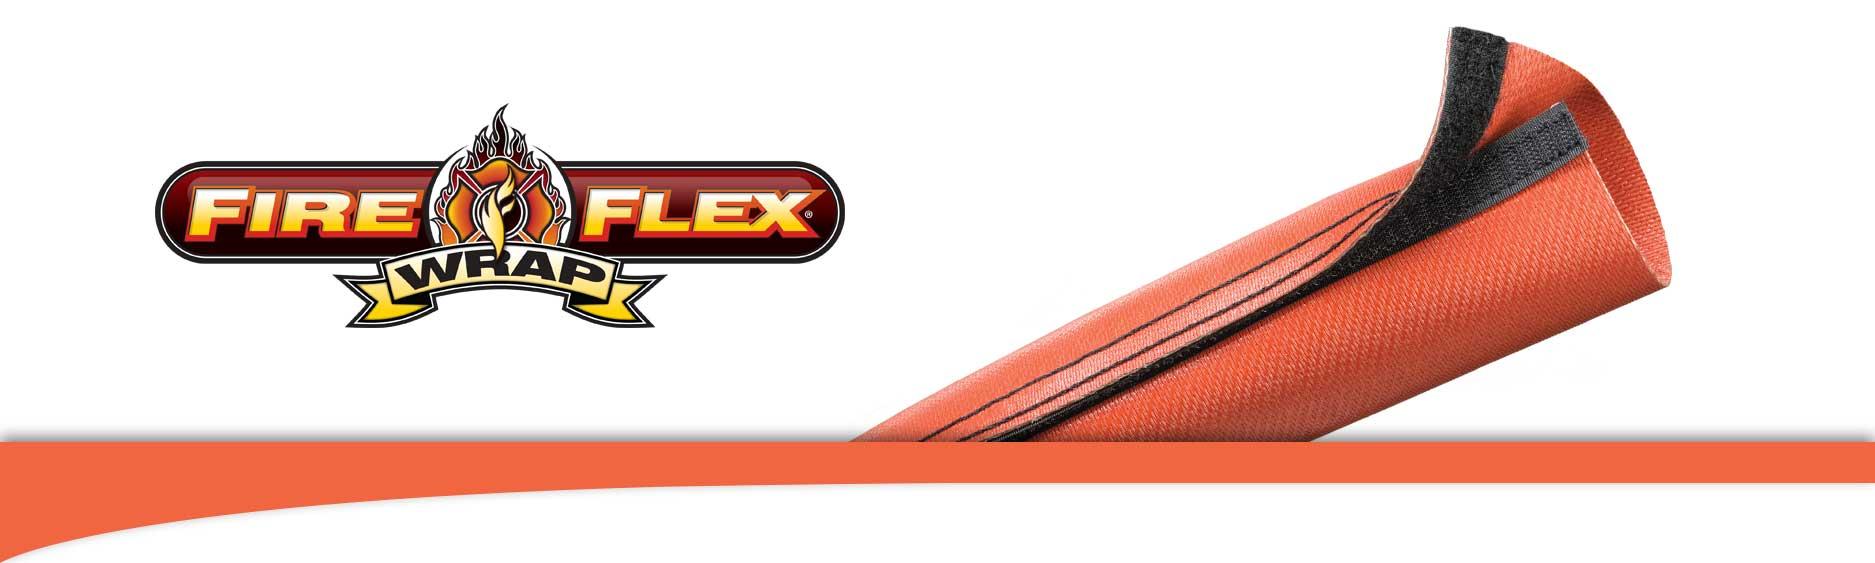 Fire Flex Wrap